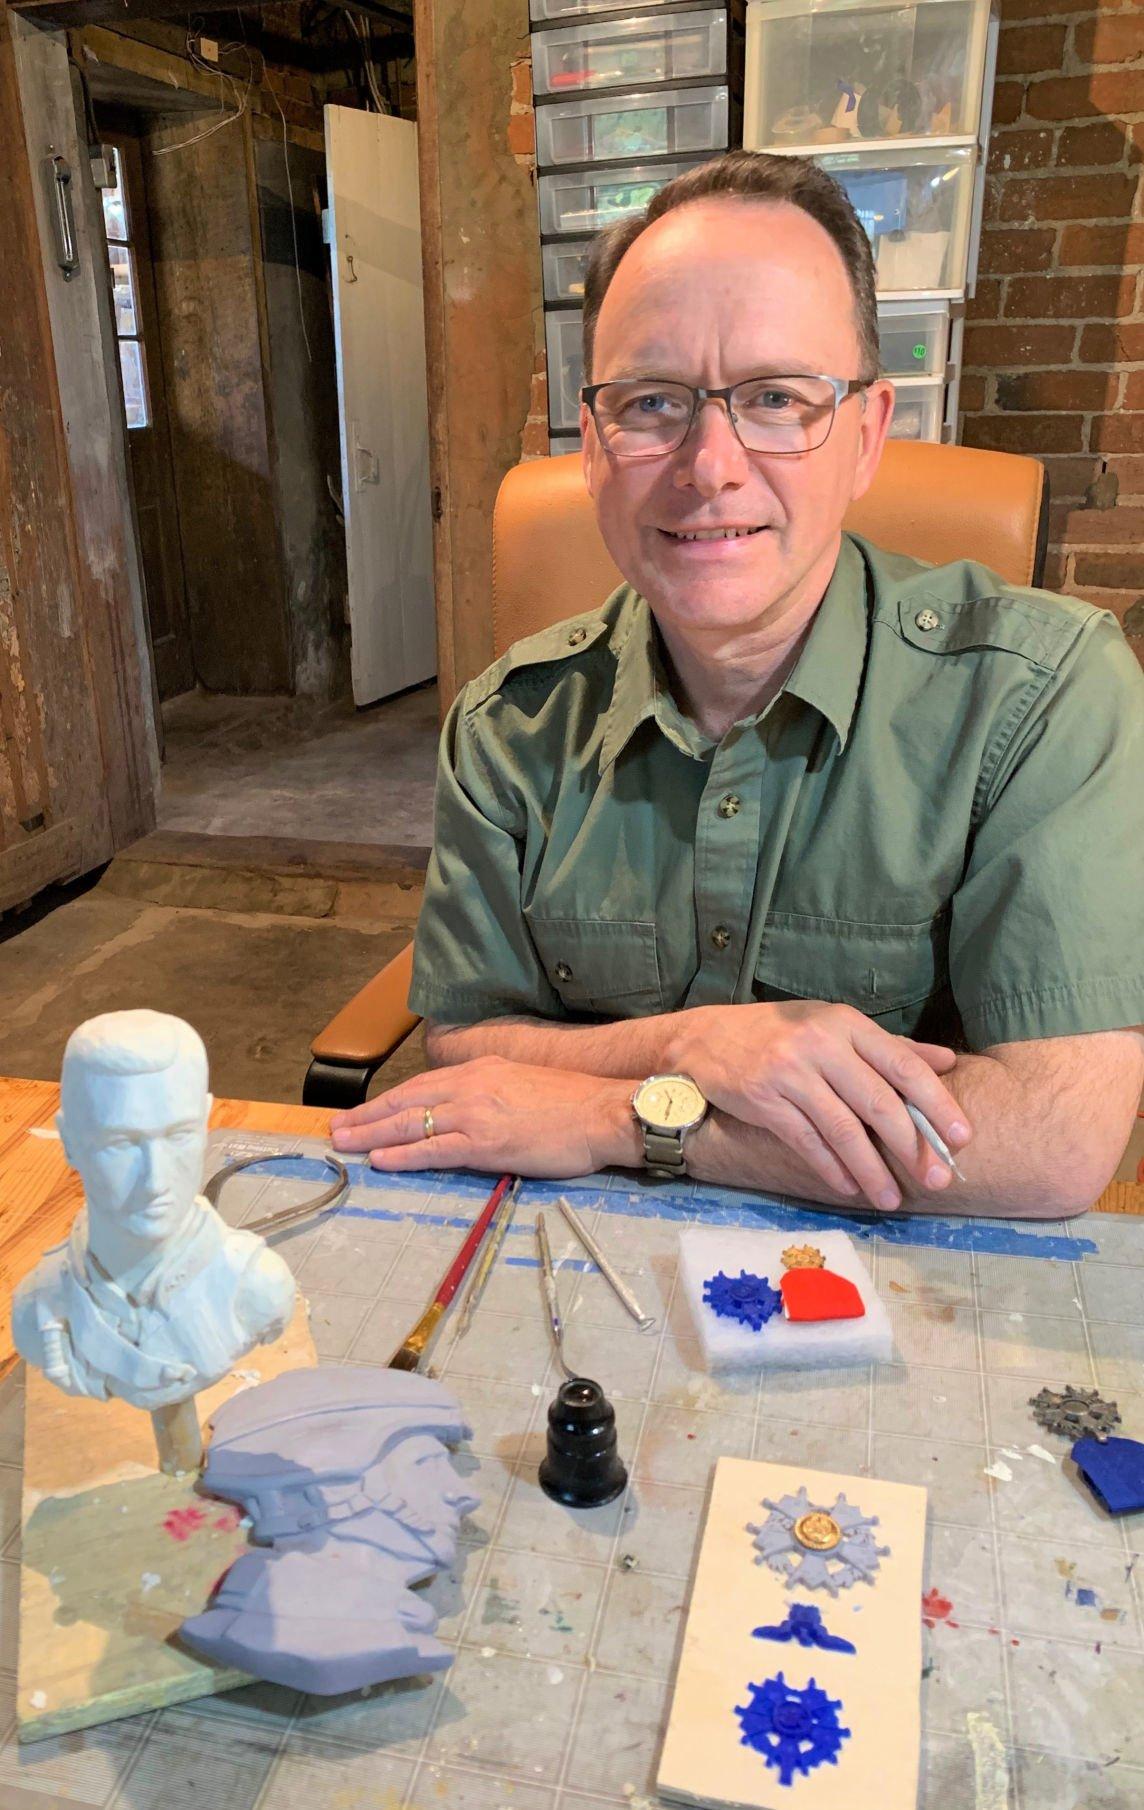 Joe Winslow with sculptures